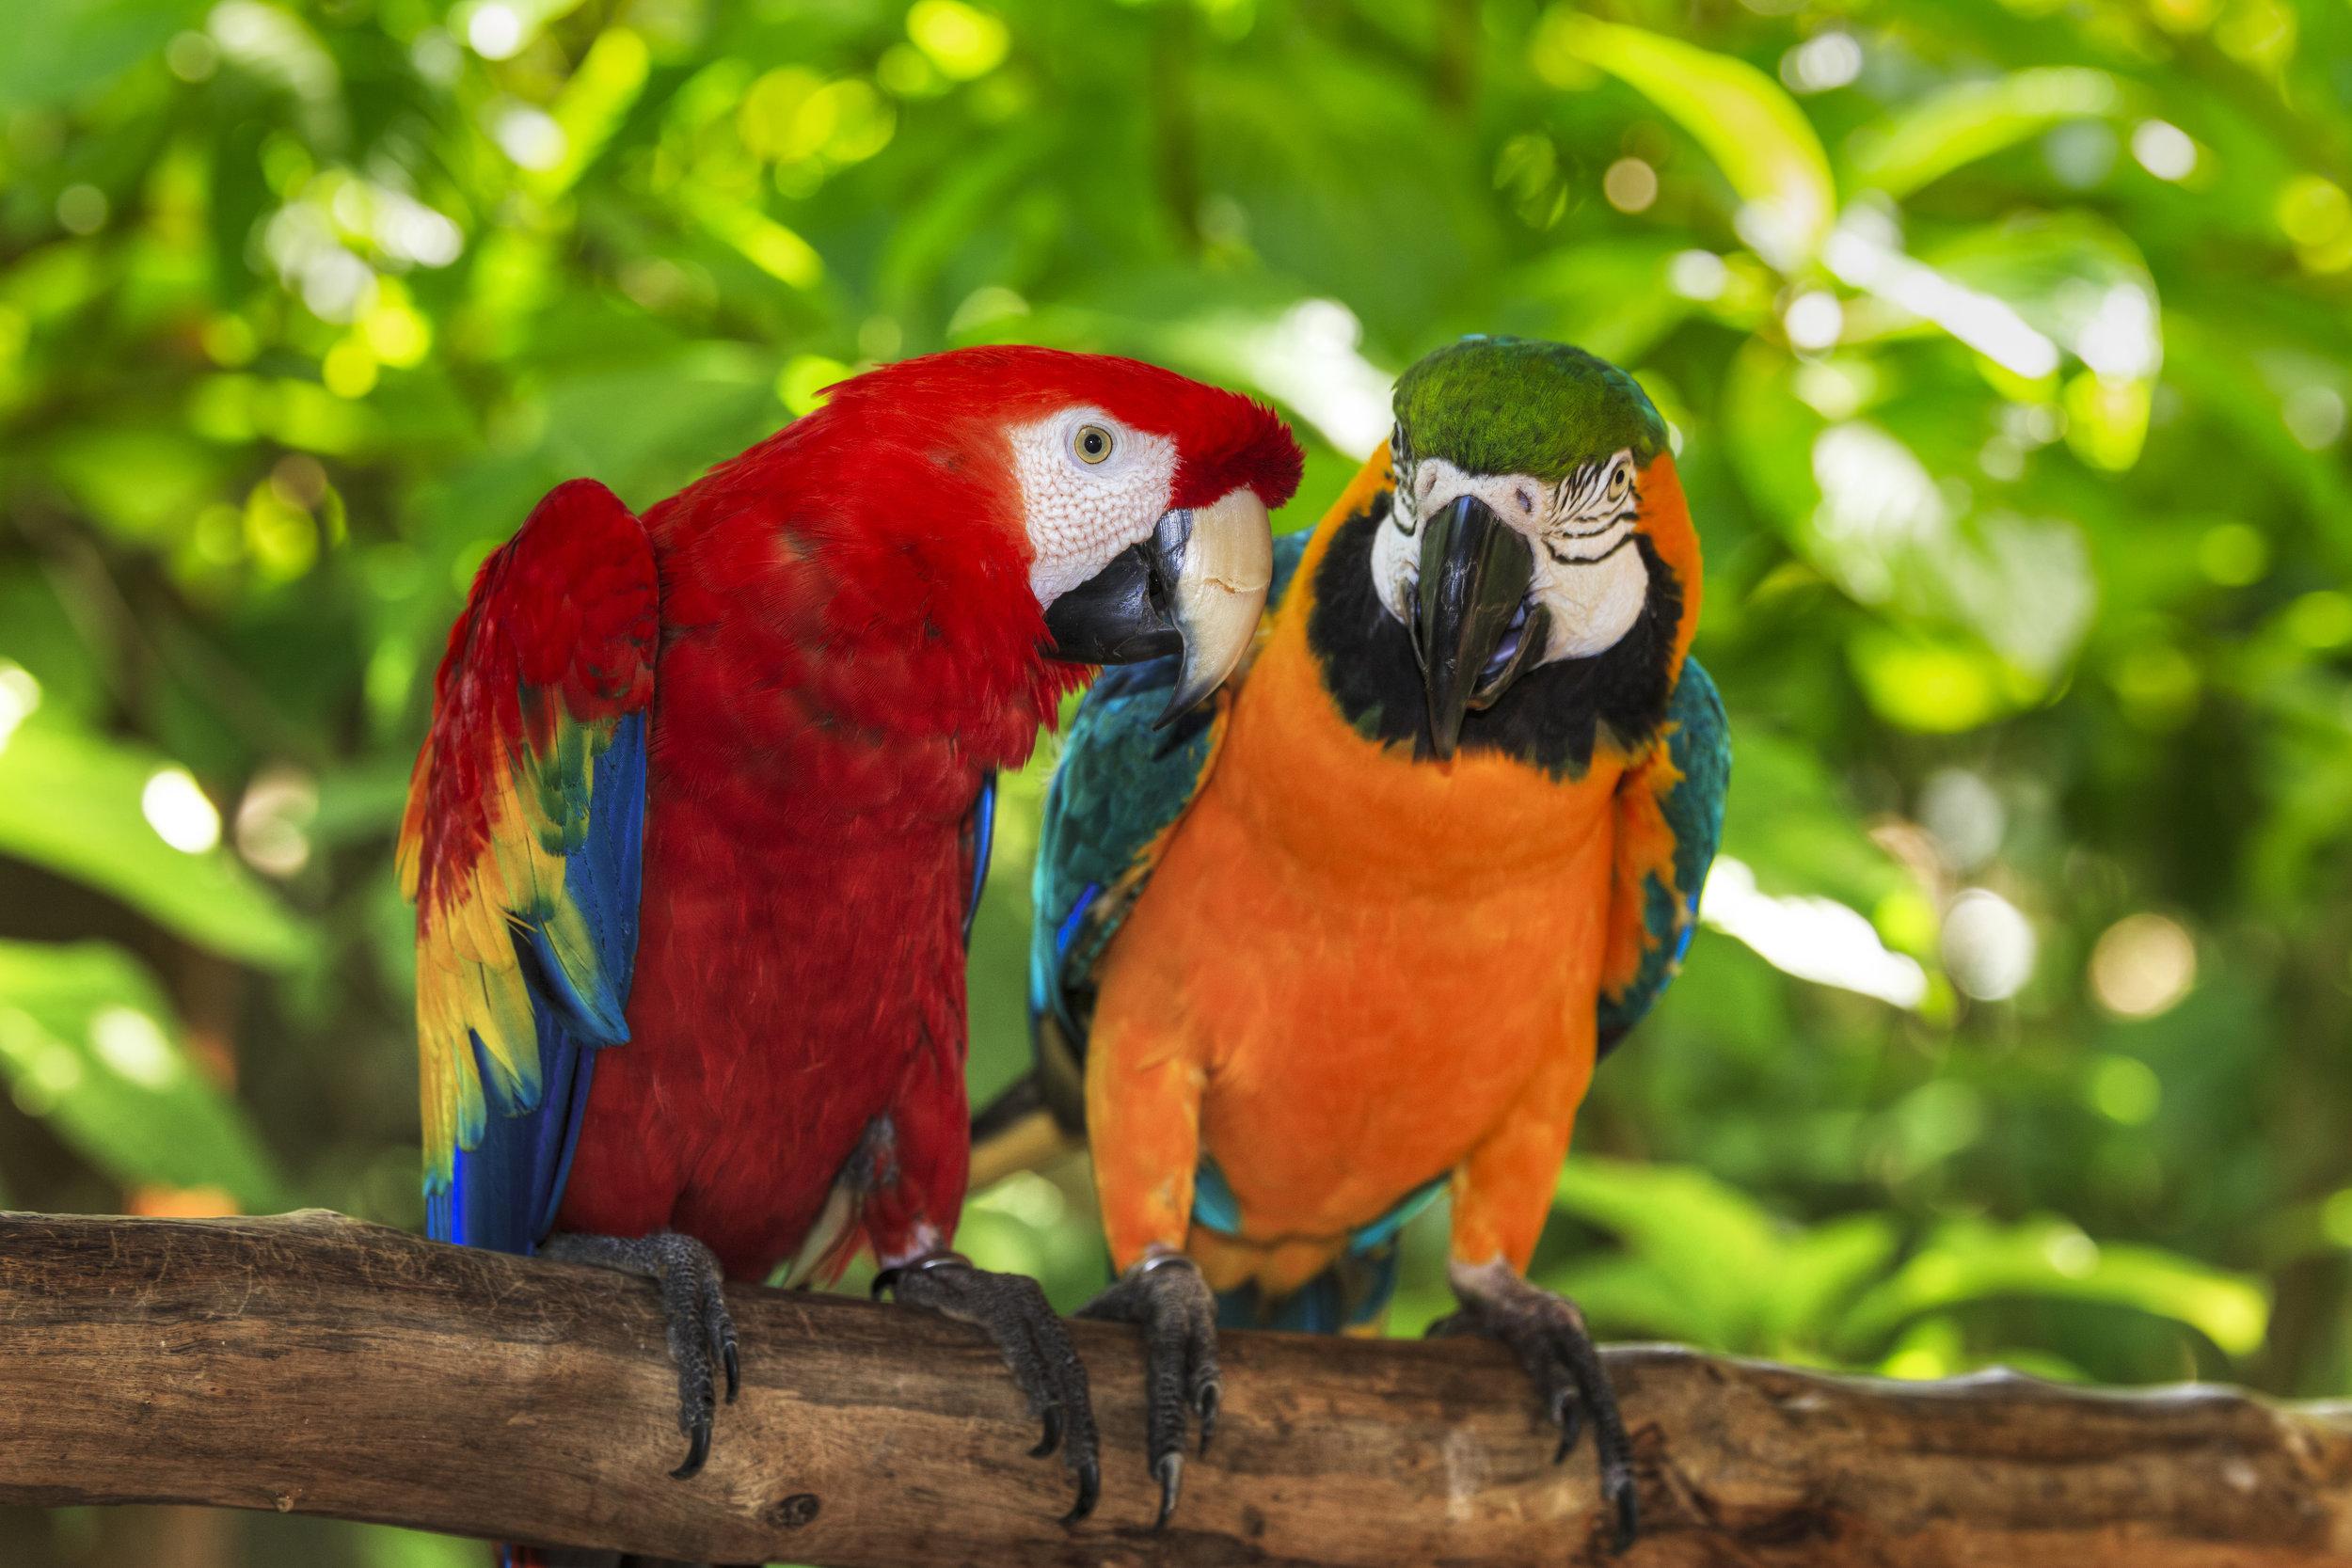 Costa Rica med vulkaner, regskog og paradisiske strender San José, Tortuguero, Dominical, Turrialba, San Gerardo de Dota. Opplev Costa Rica med Espnes.